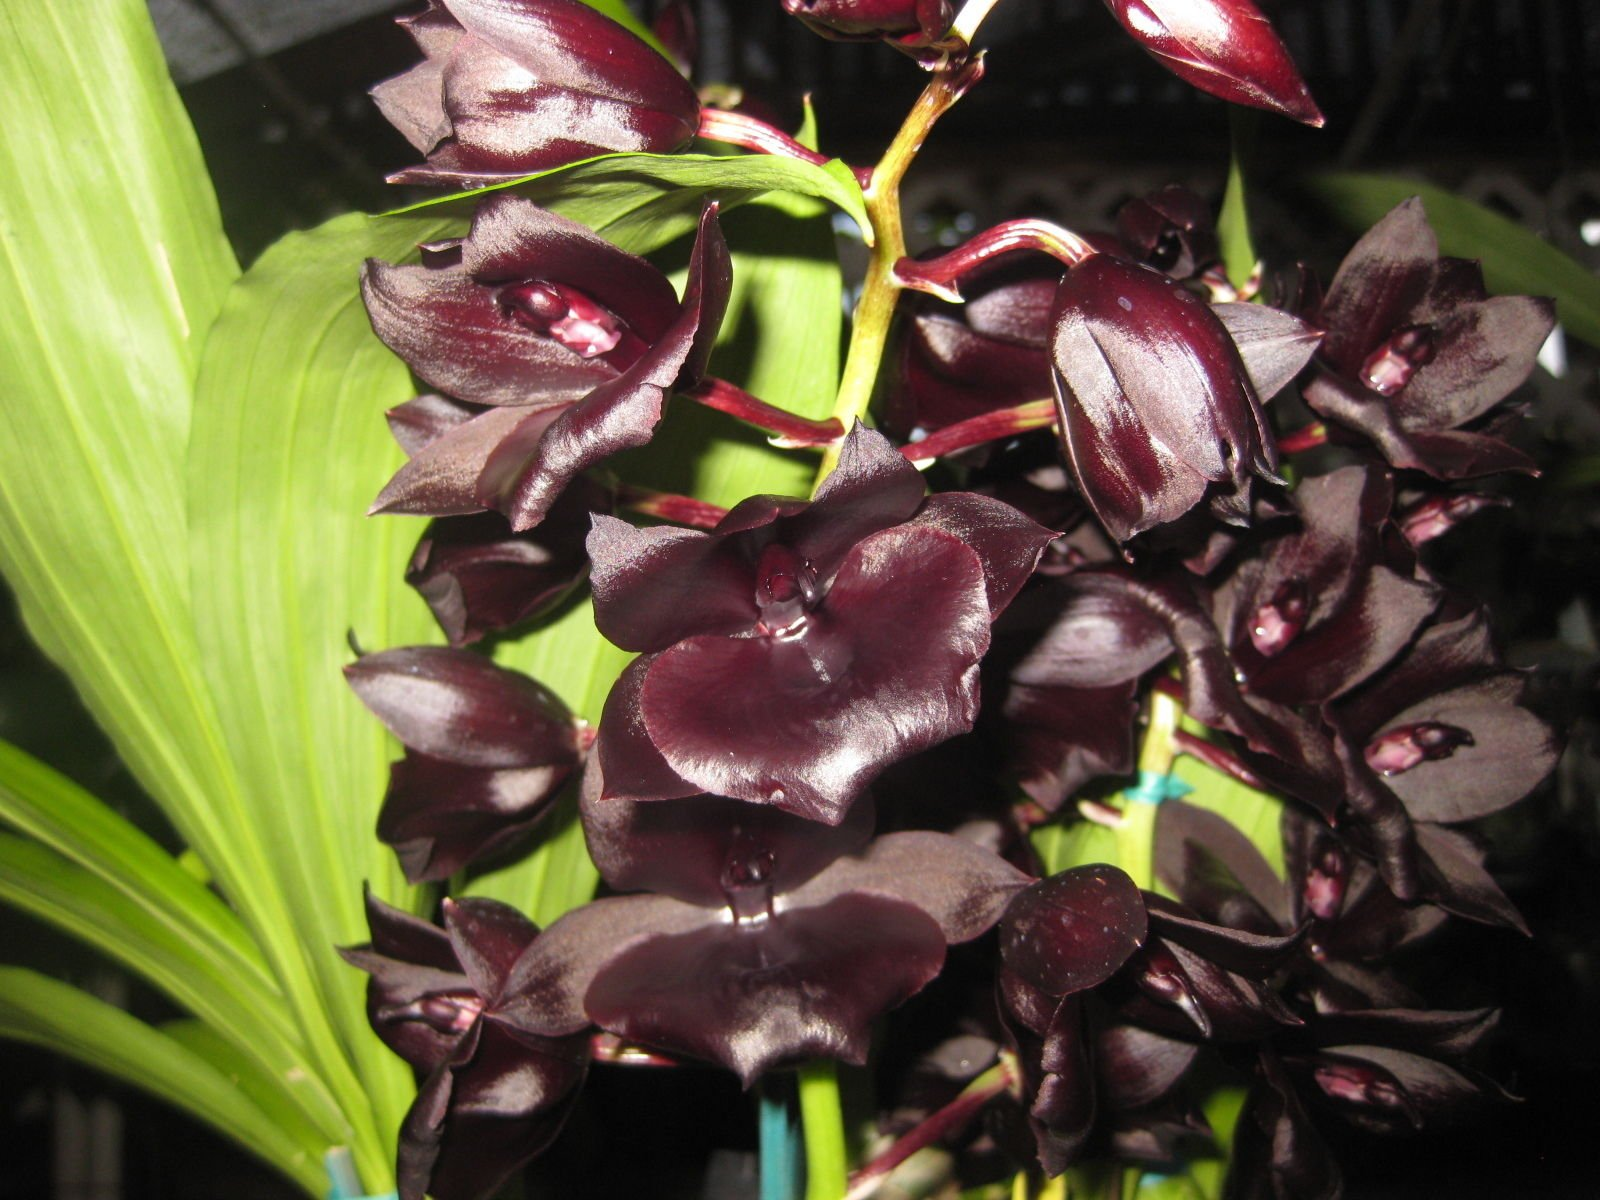 Kawamoto Orchid Nursery Monnierara Millennium Magic 'Witchcraft' AM/AOS Collectors item! Excellent! Orchid plant